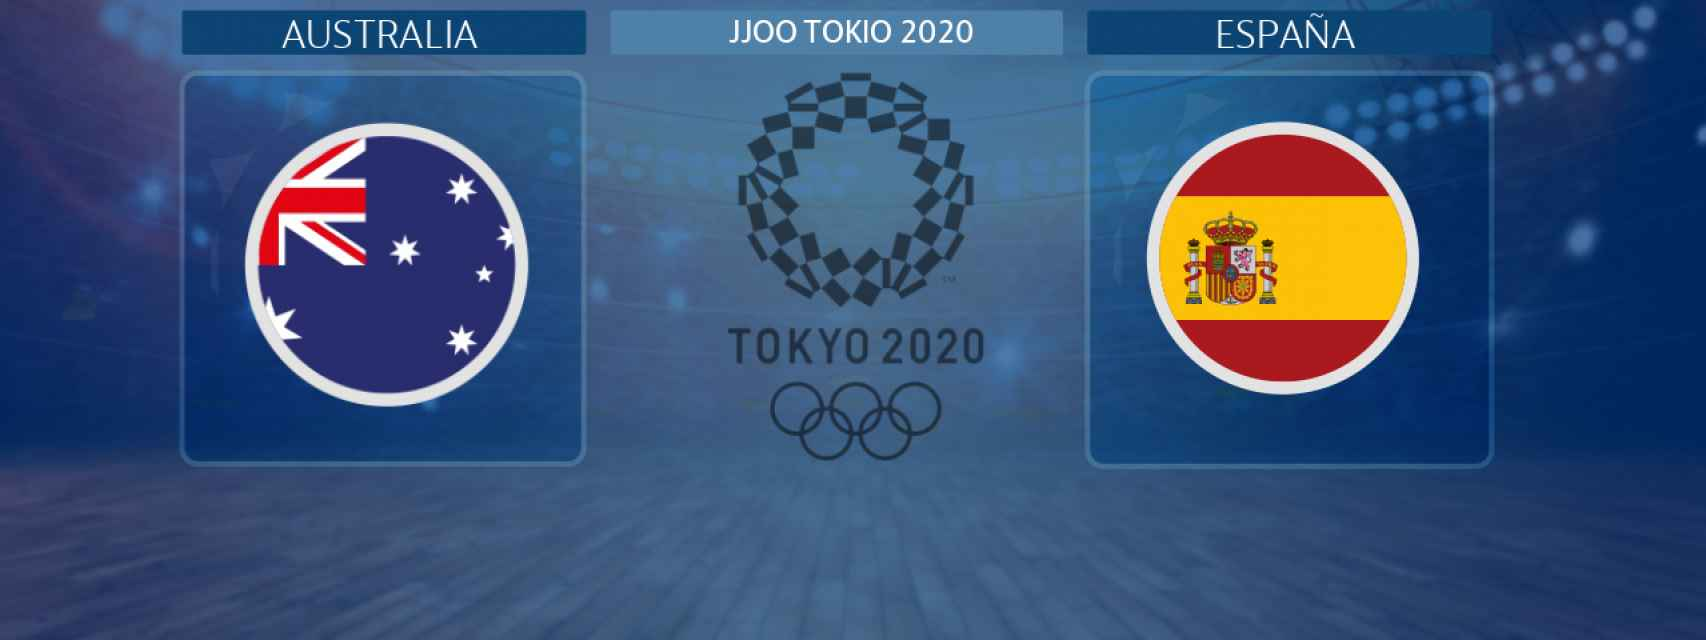 Australia - España, partido de los JJOO de Tokio 2020